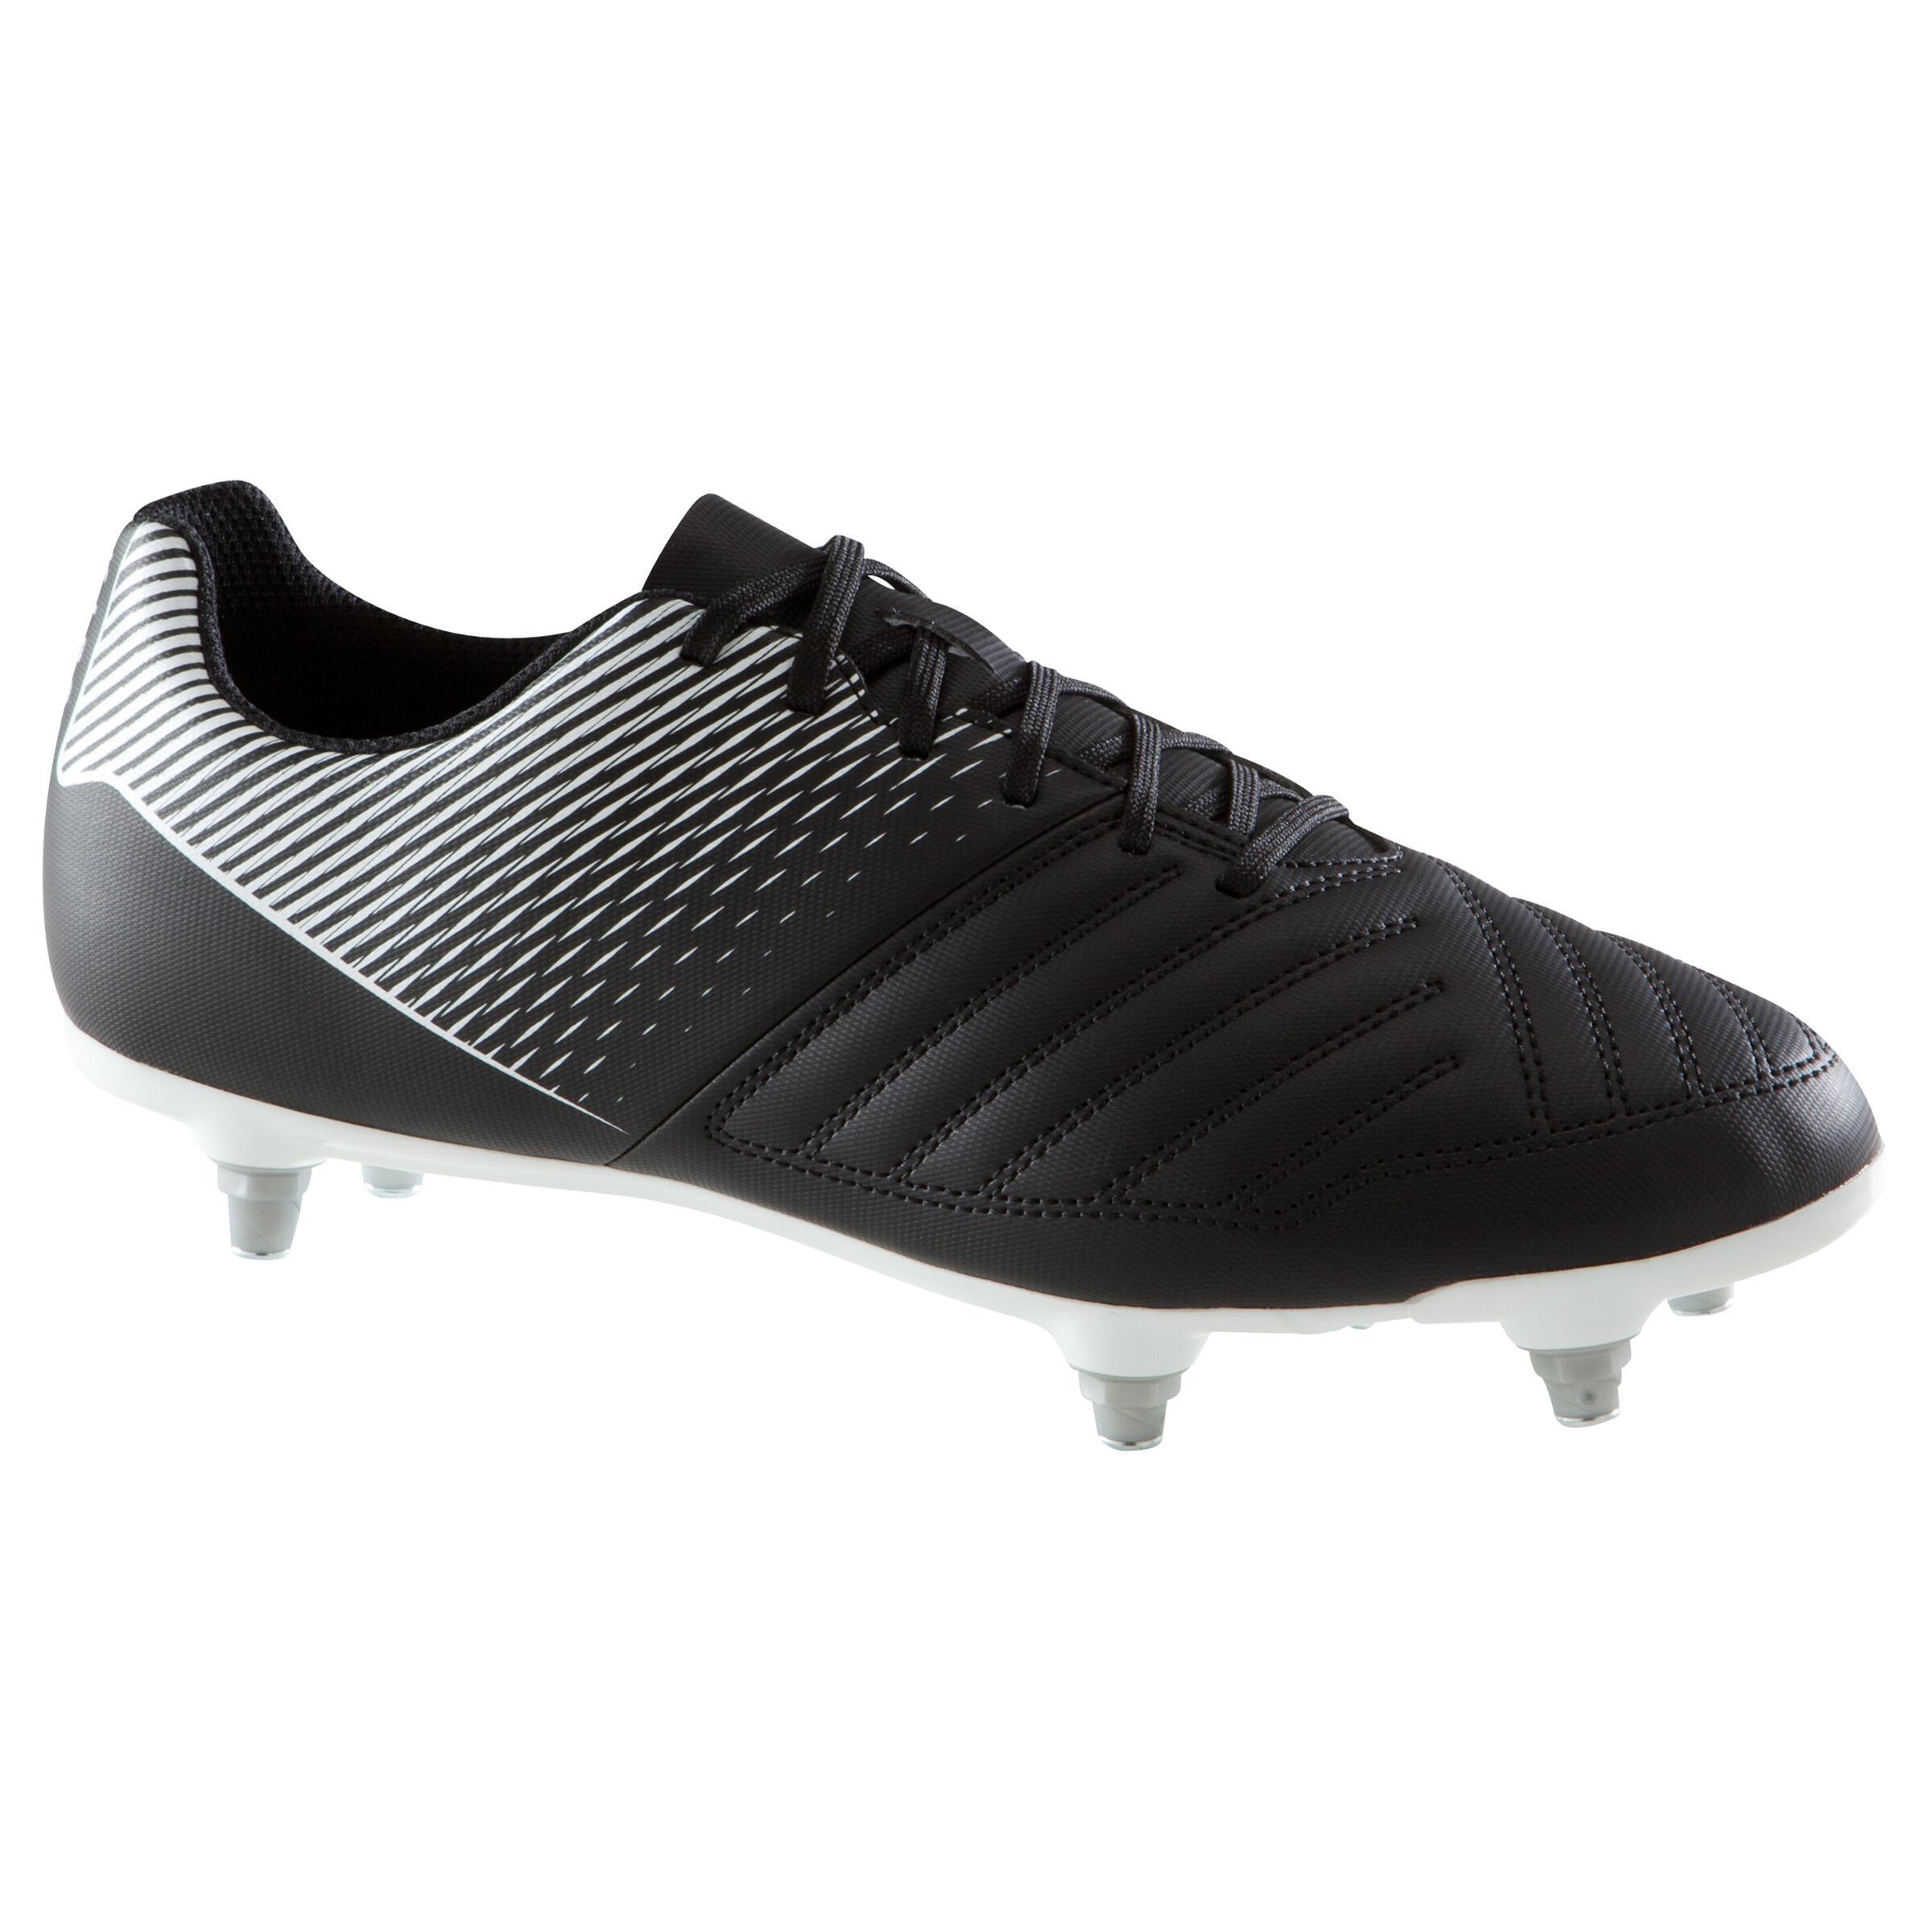 Kipsta Voetbalschoenen Agility 100 SG zwart/wit